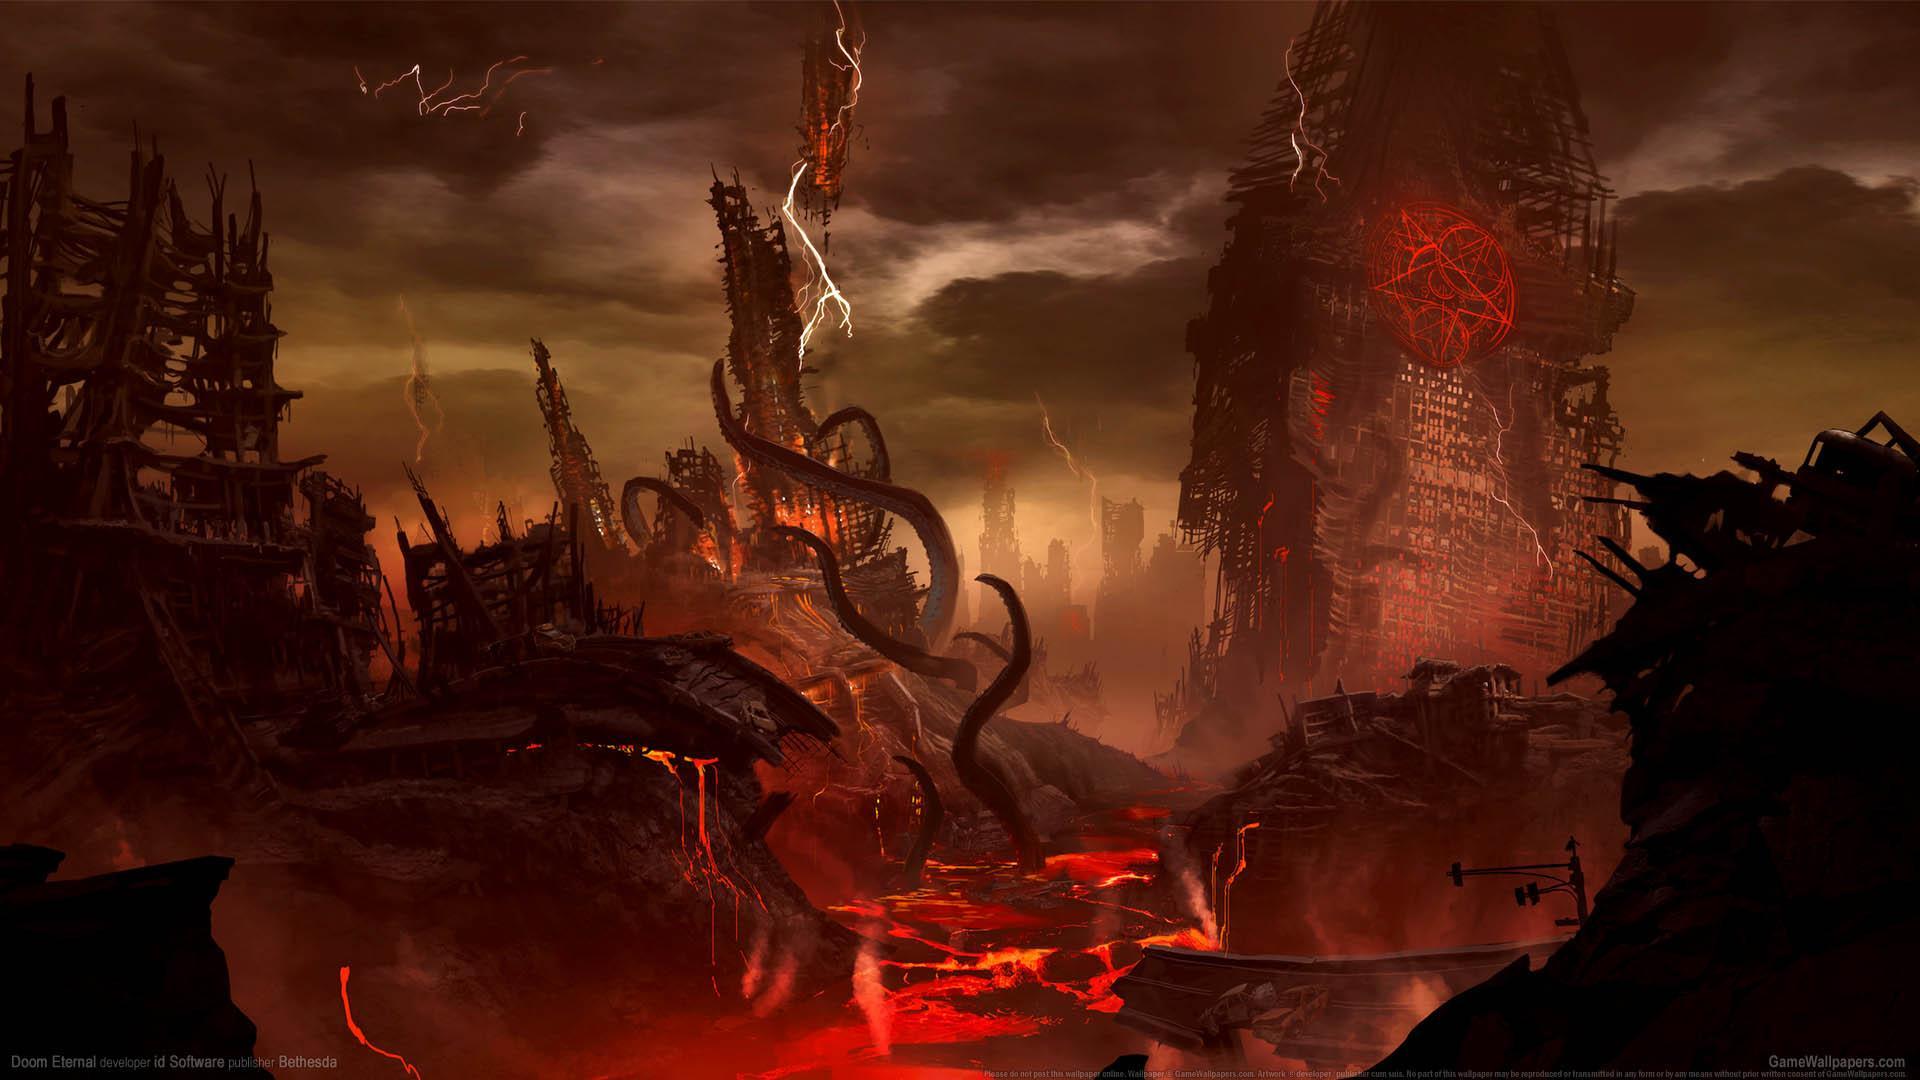 Doom Eternal Video Game Wallpapers Wallpaper Cave